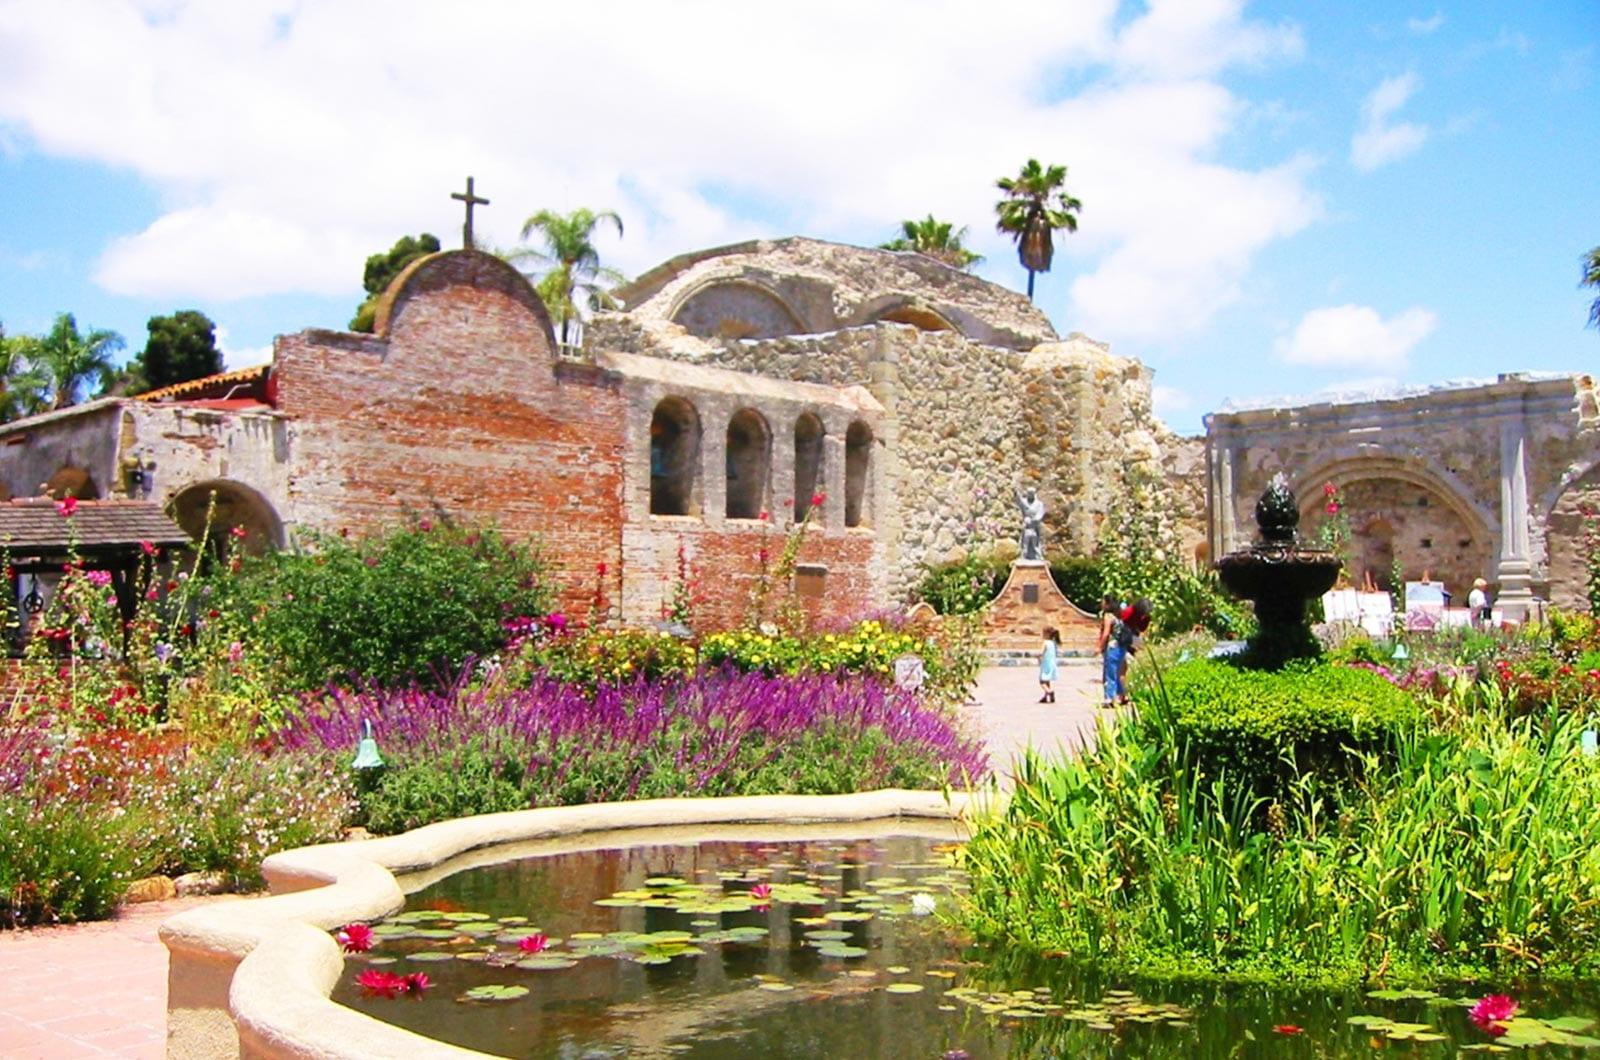 Featured | San Juan Capistrano Real Estate Photographer | San Juan Capistrano Virtual Tour Photographer | San Juan Capistrano Aerial Photography Services